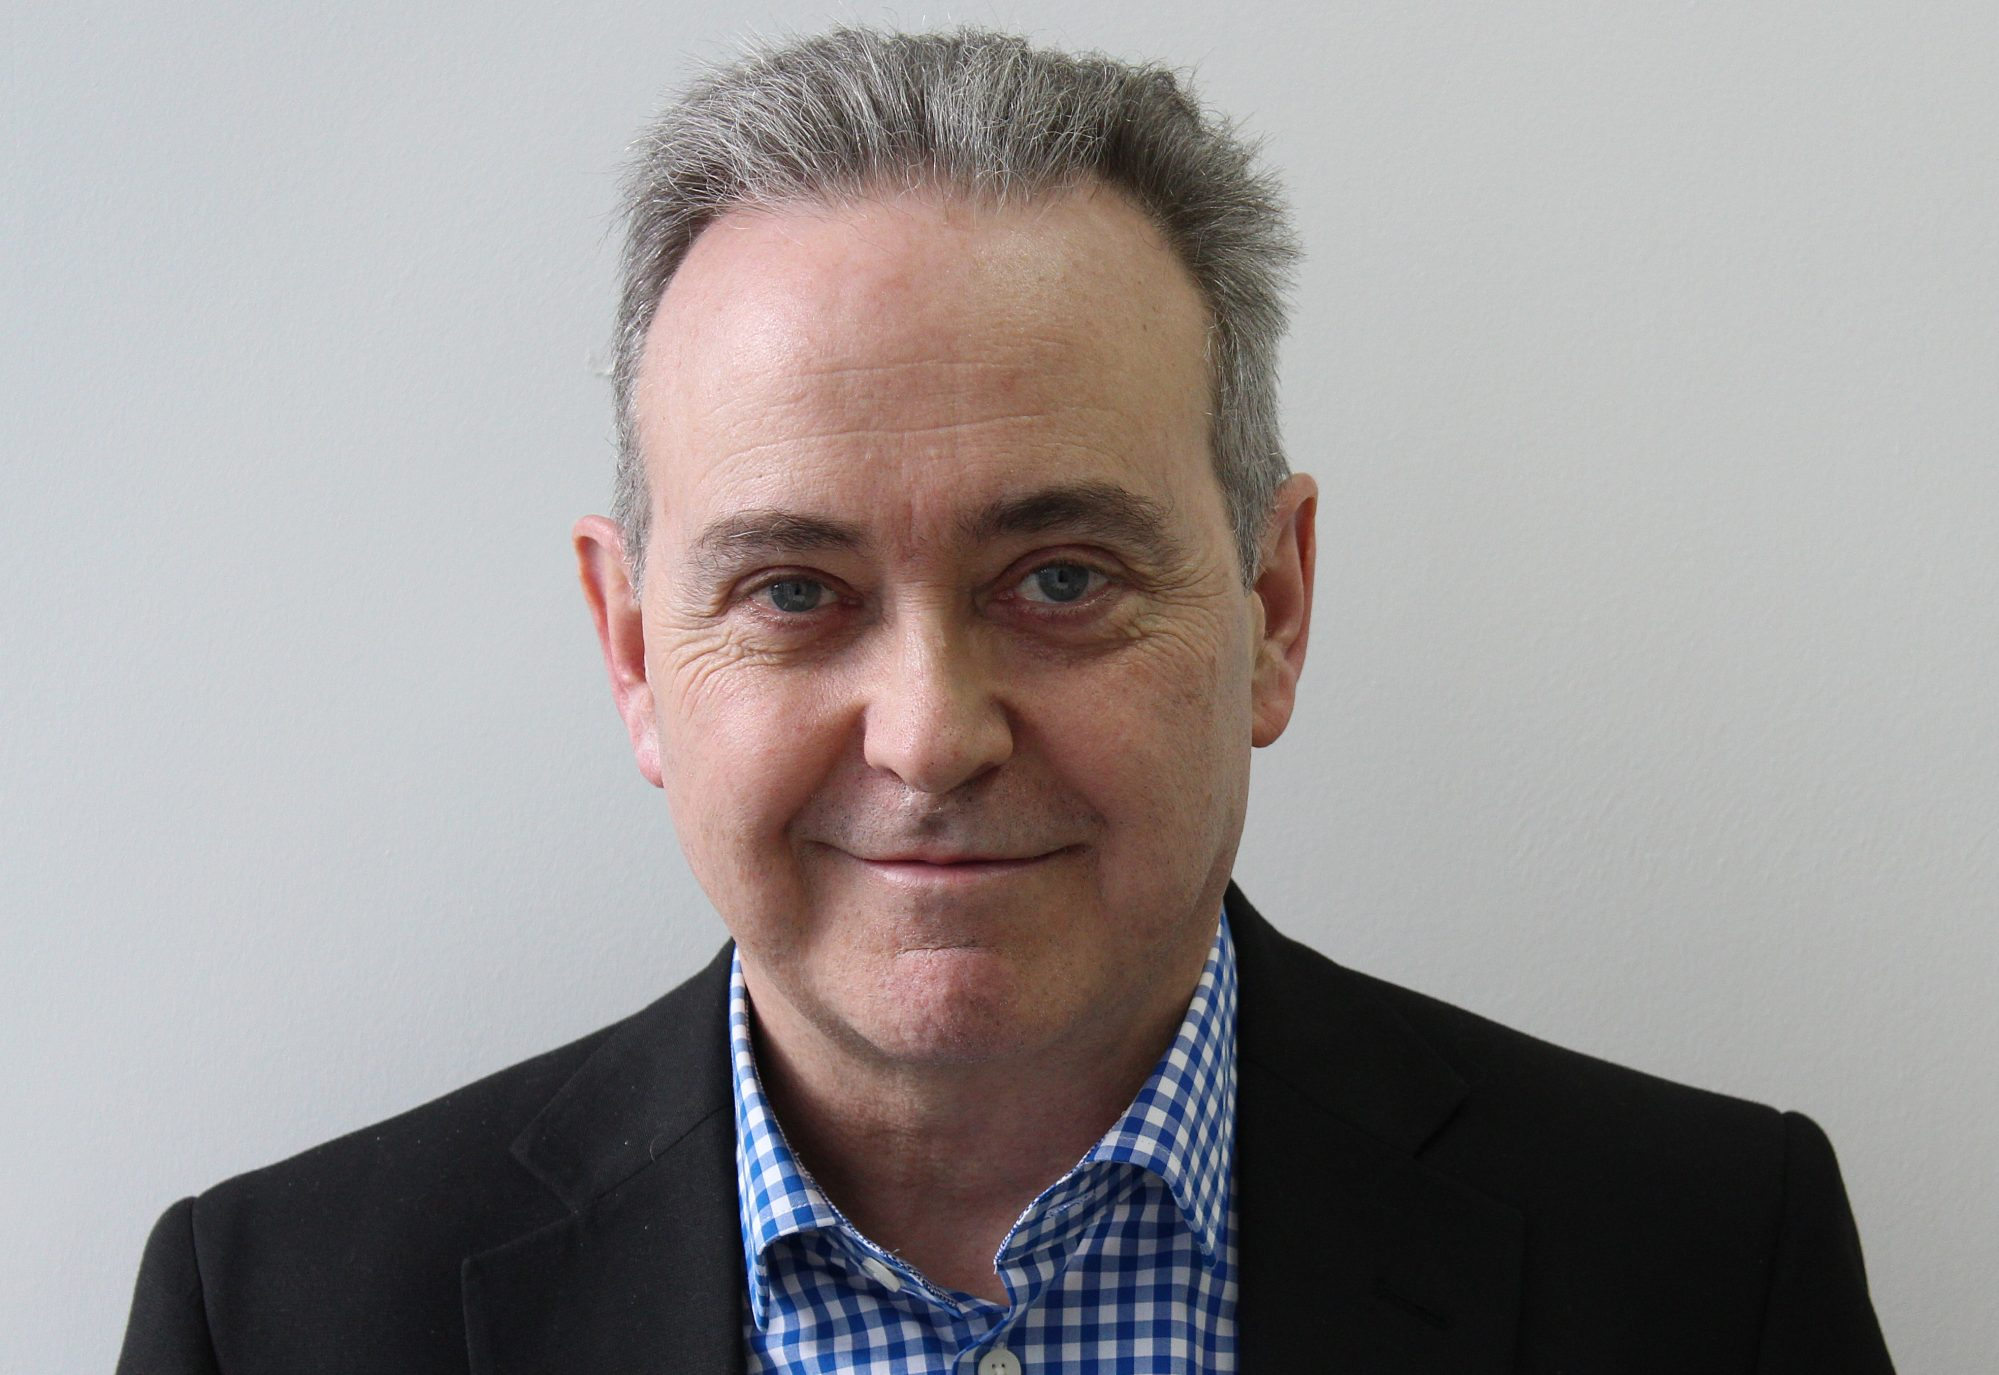 Headshot of Paul Buckley